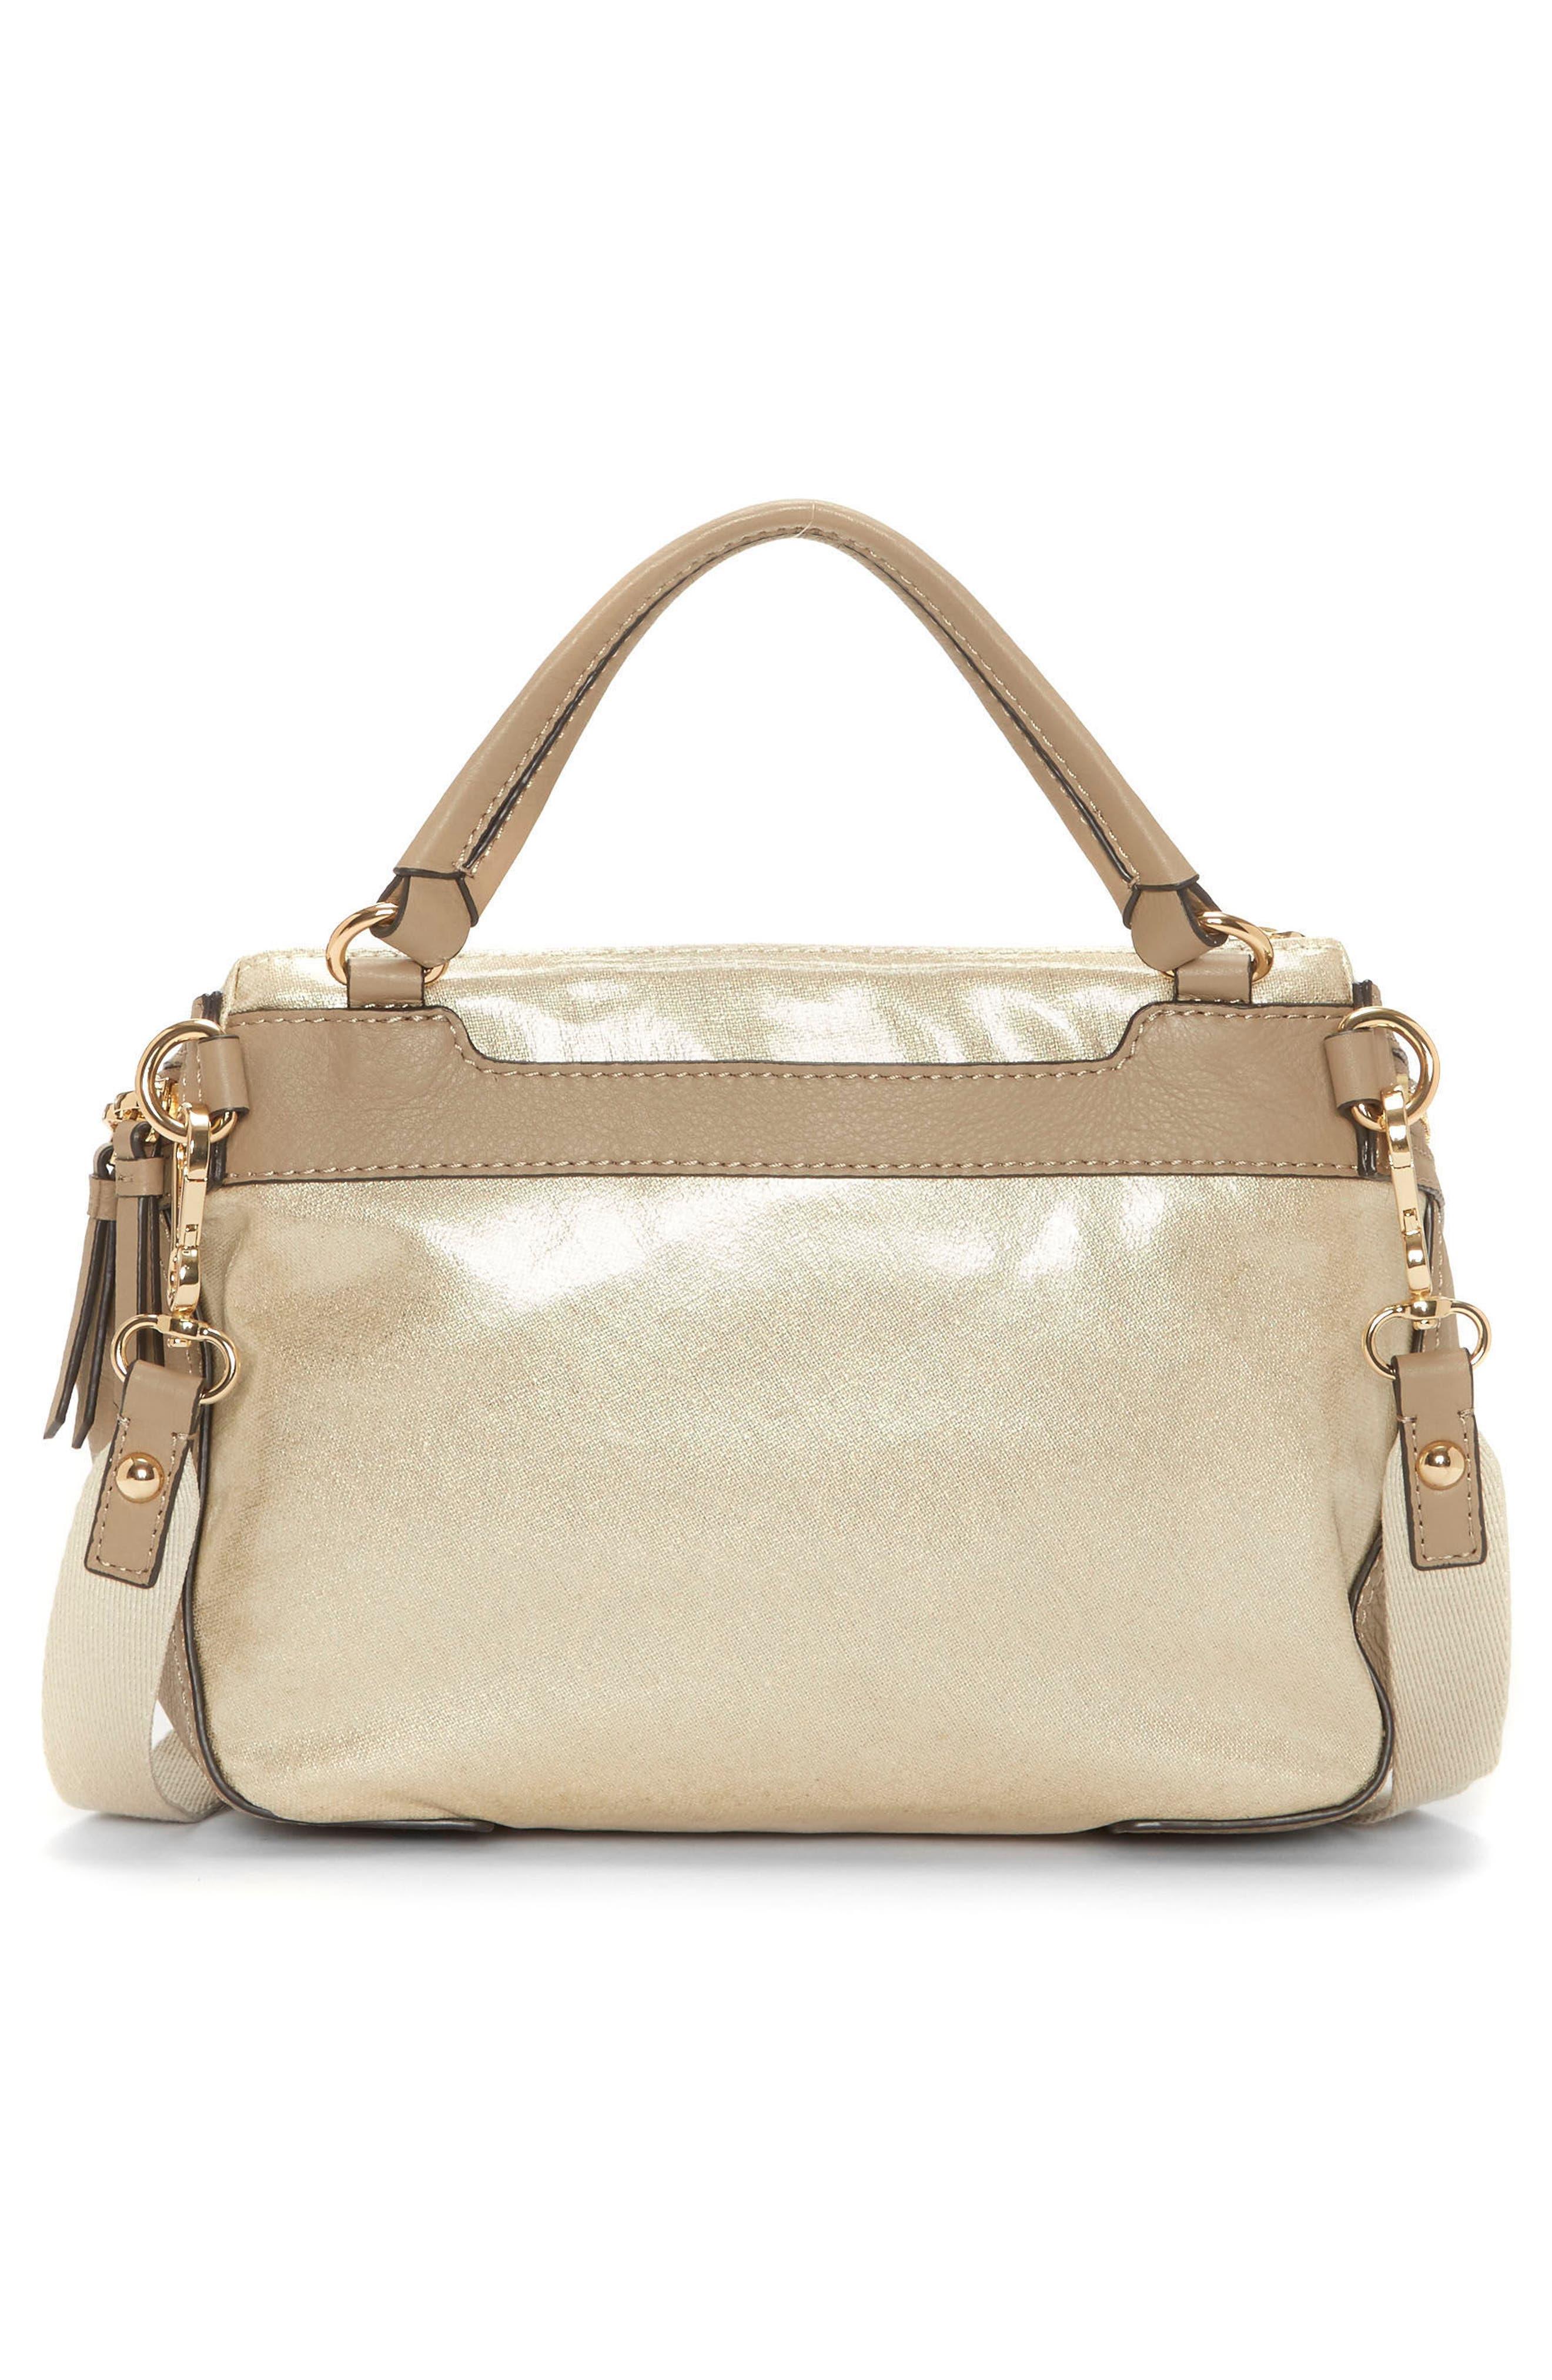 Medium Patch Nylon & Leather Crossbody Bag,                             Alternate thumbnail 2, color,                             Gold